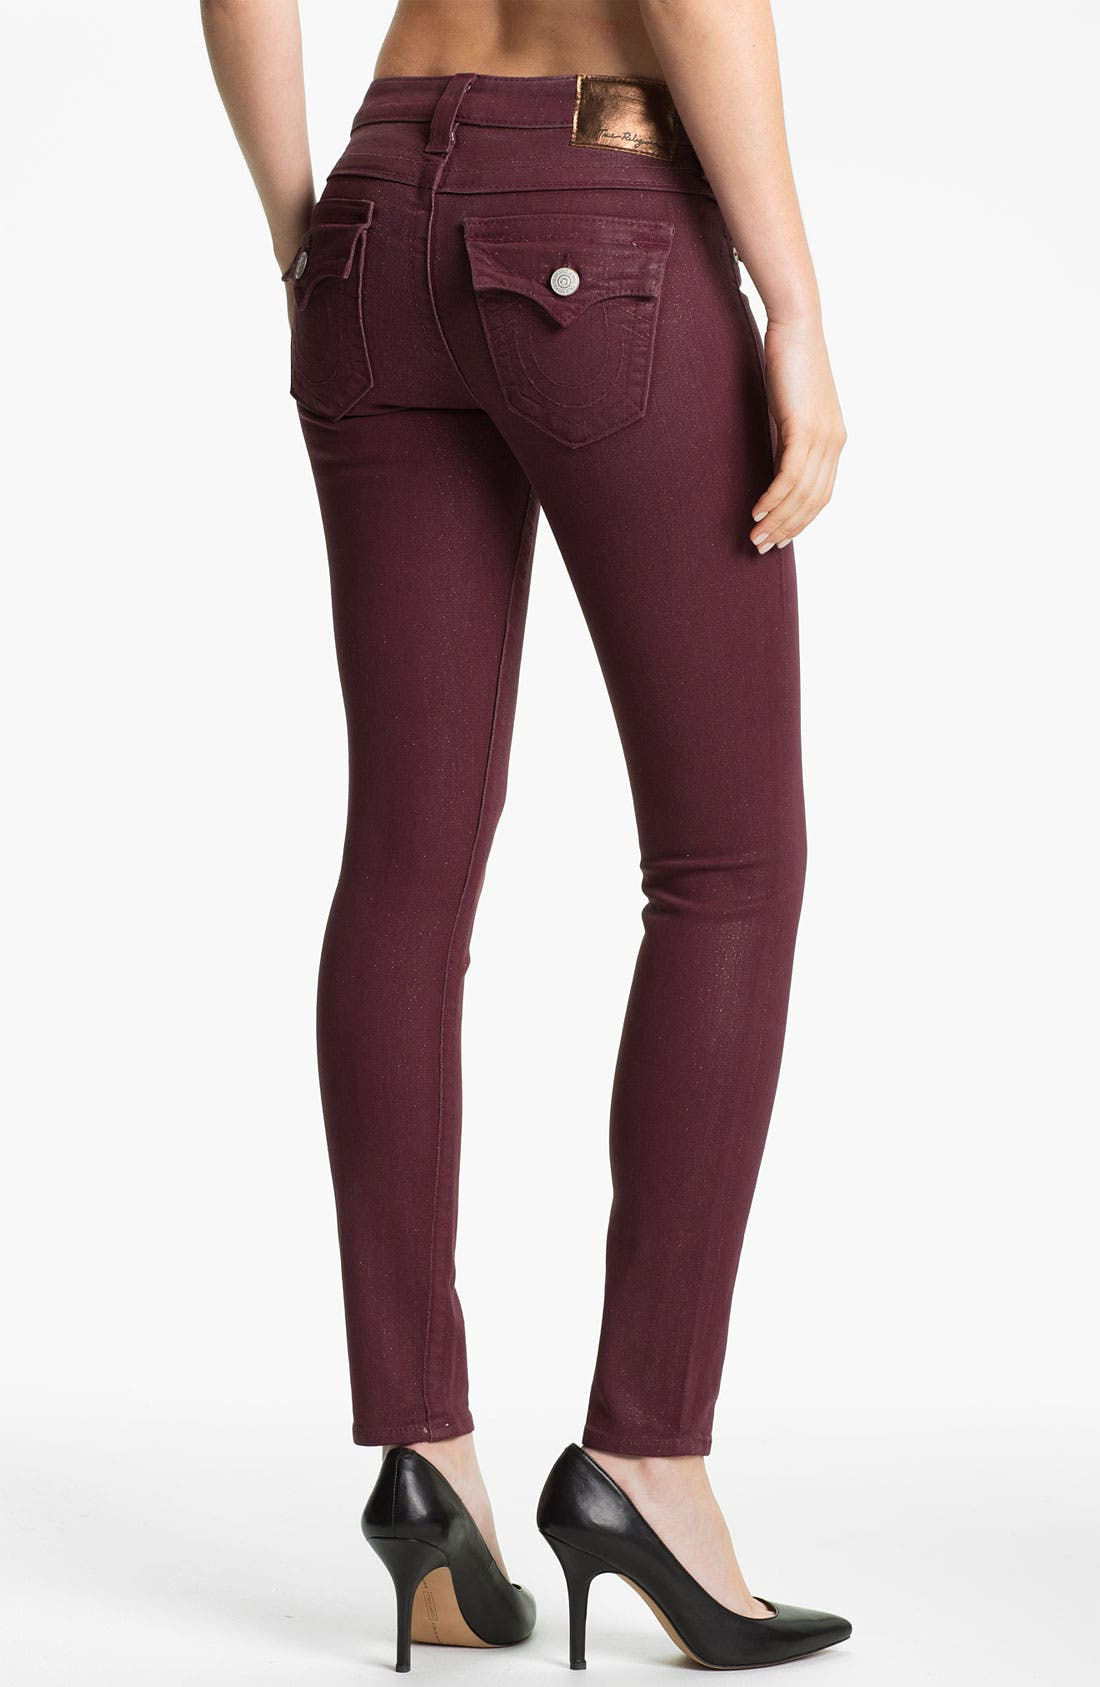 Alternate Image 2  - True Religion Brand Jeans 'Serena' Coated Skinny Leg Jeans (Maroon)